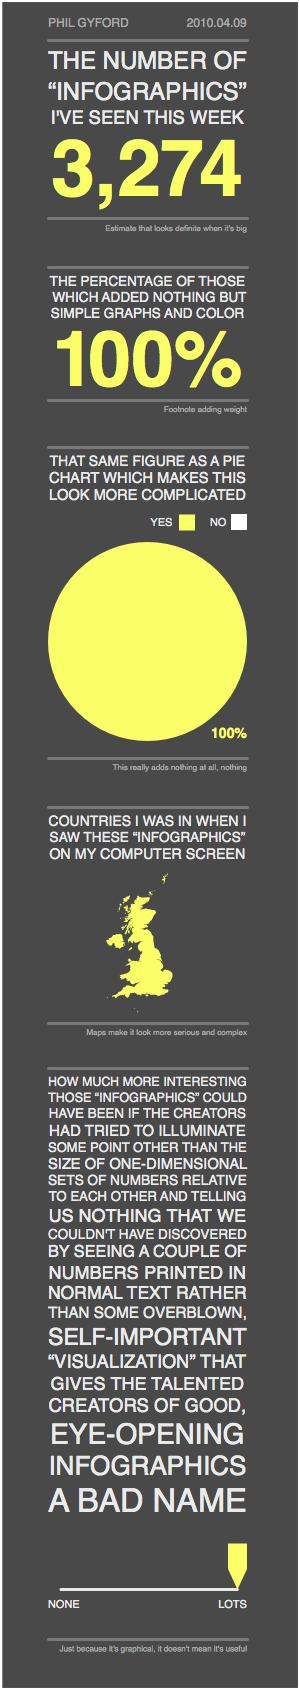 Infographic Backlash